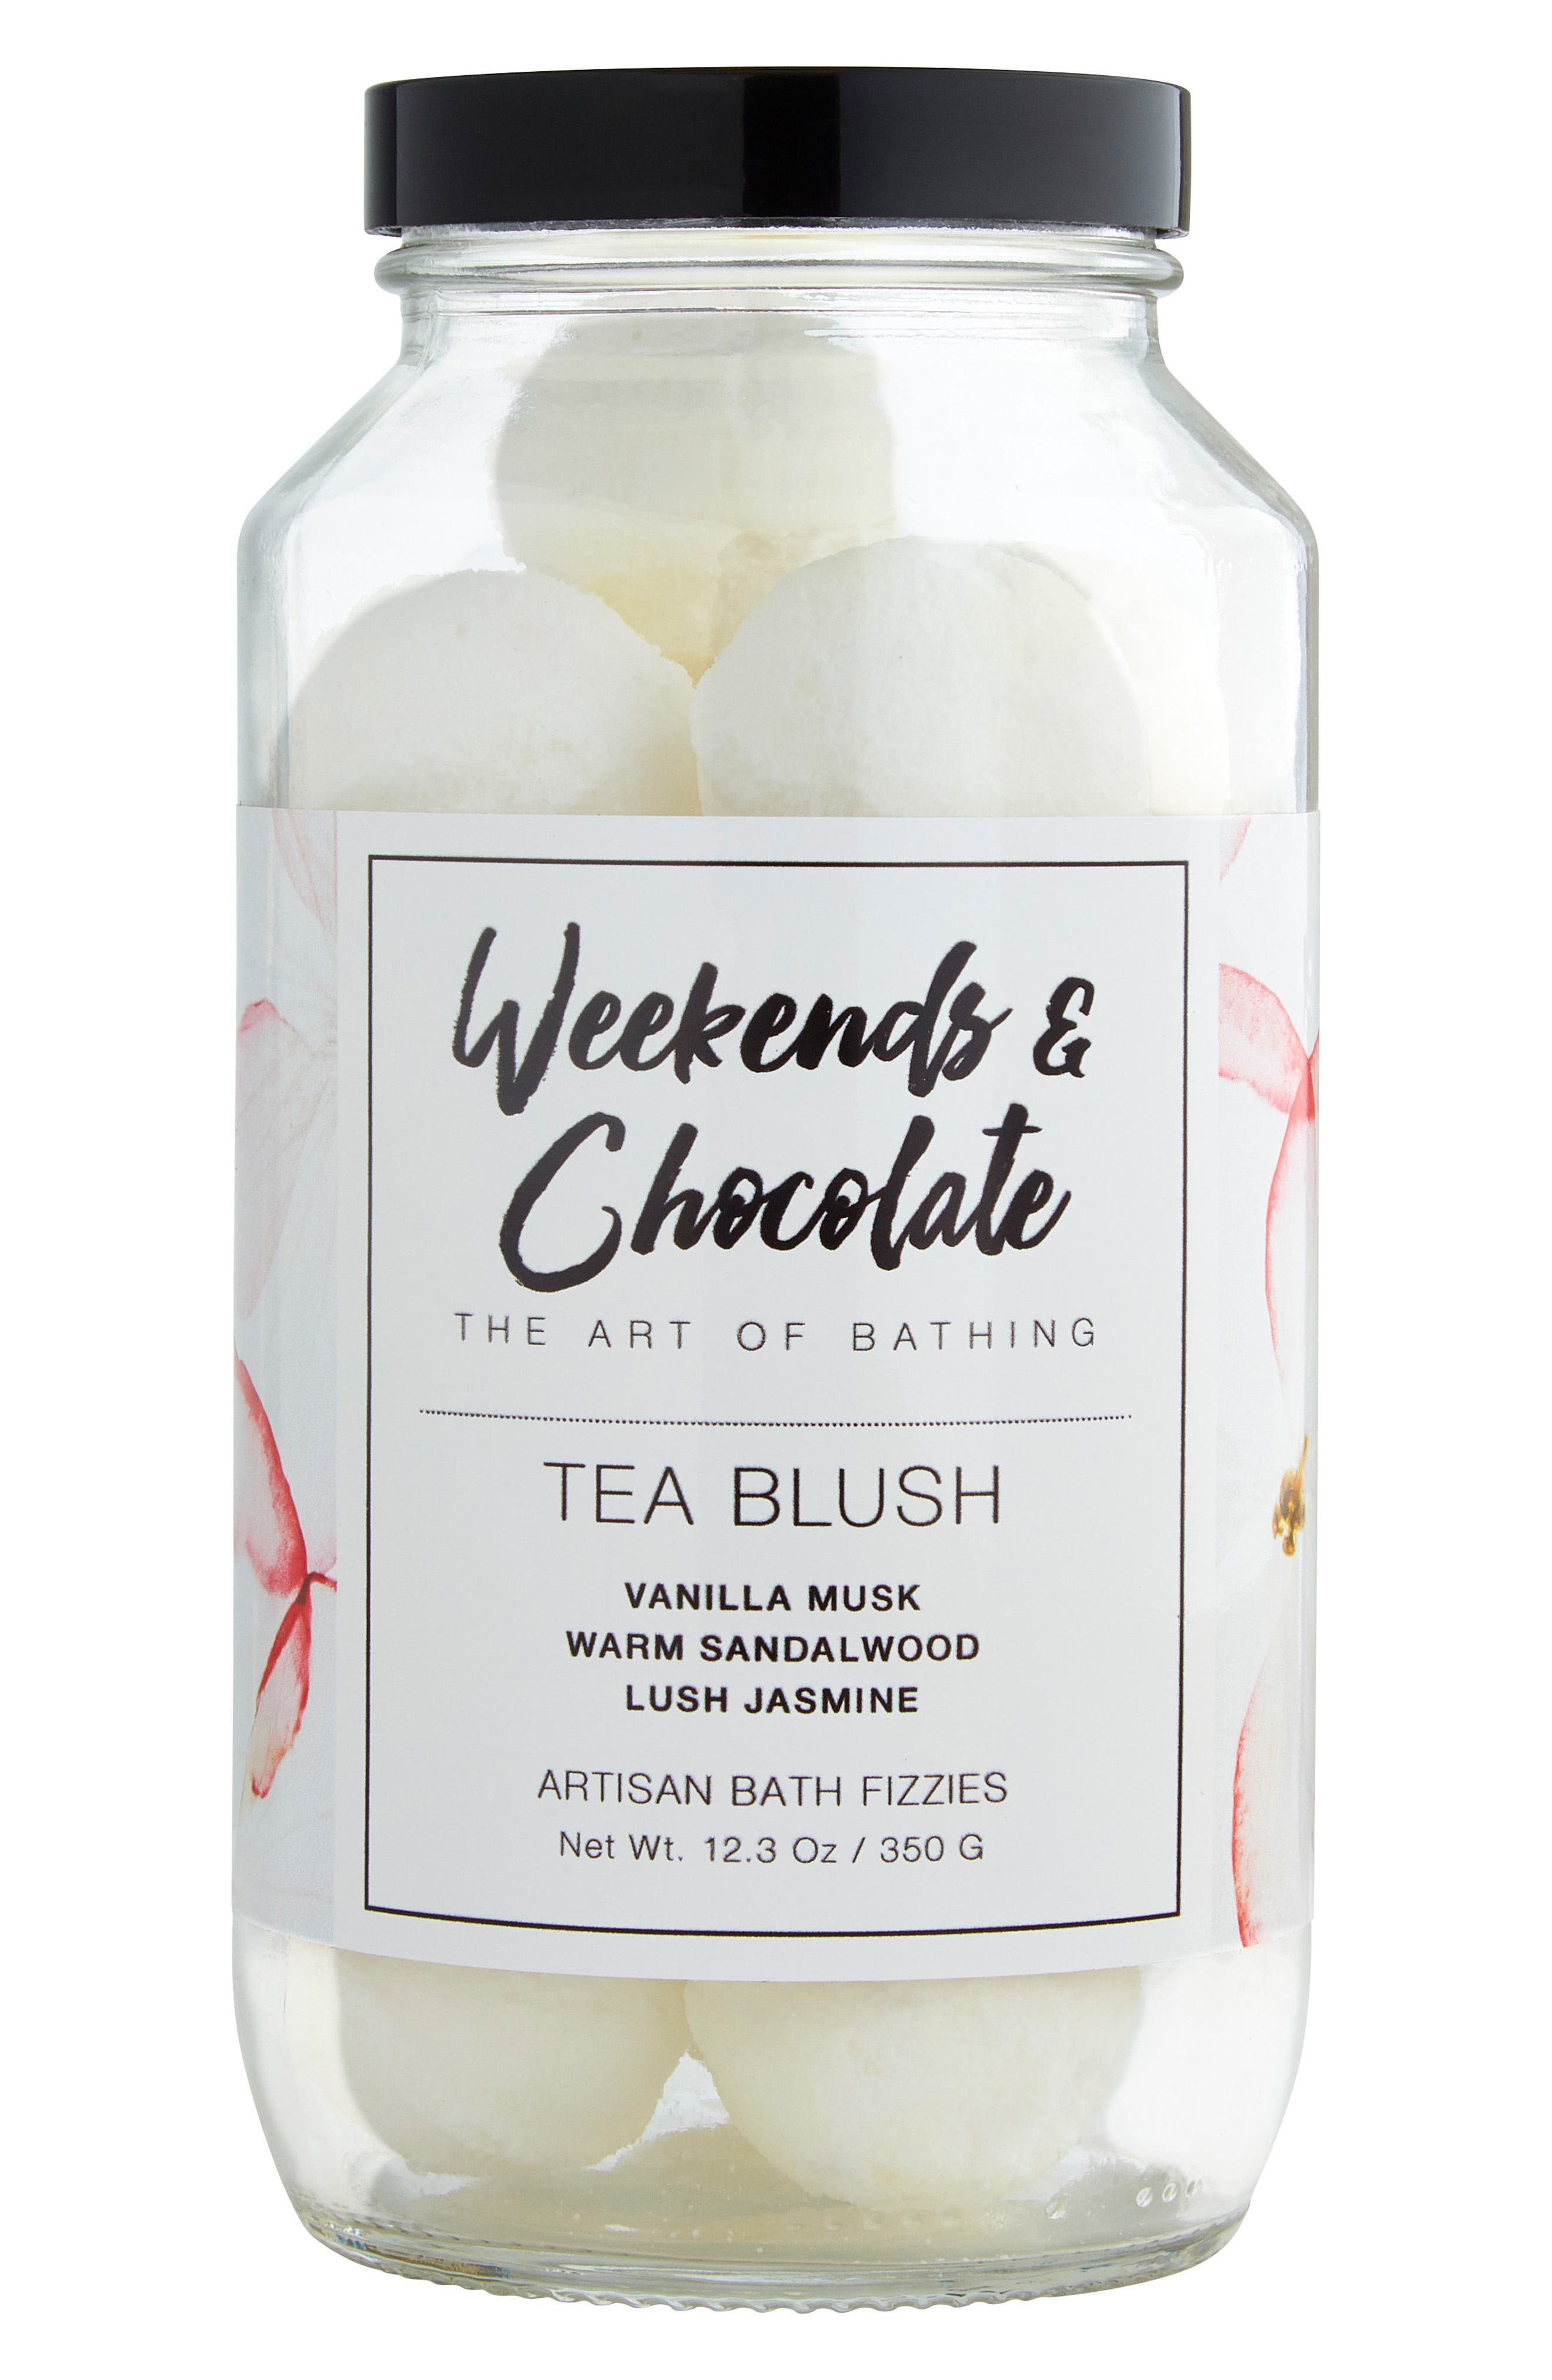 Main Image - Weekends & Chocolate Tea Blush Bath Fizzies